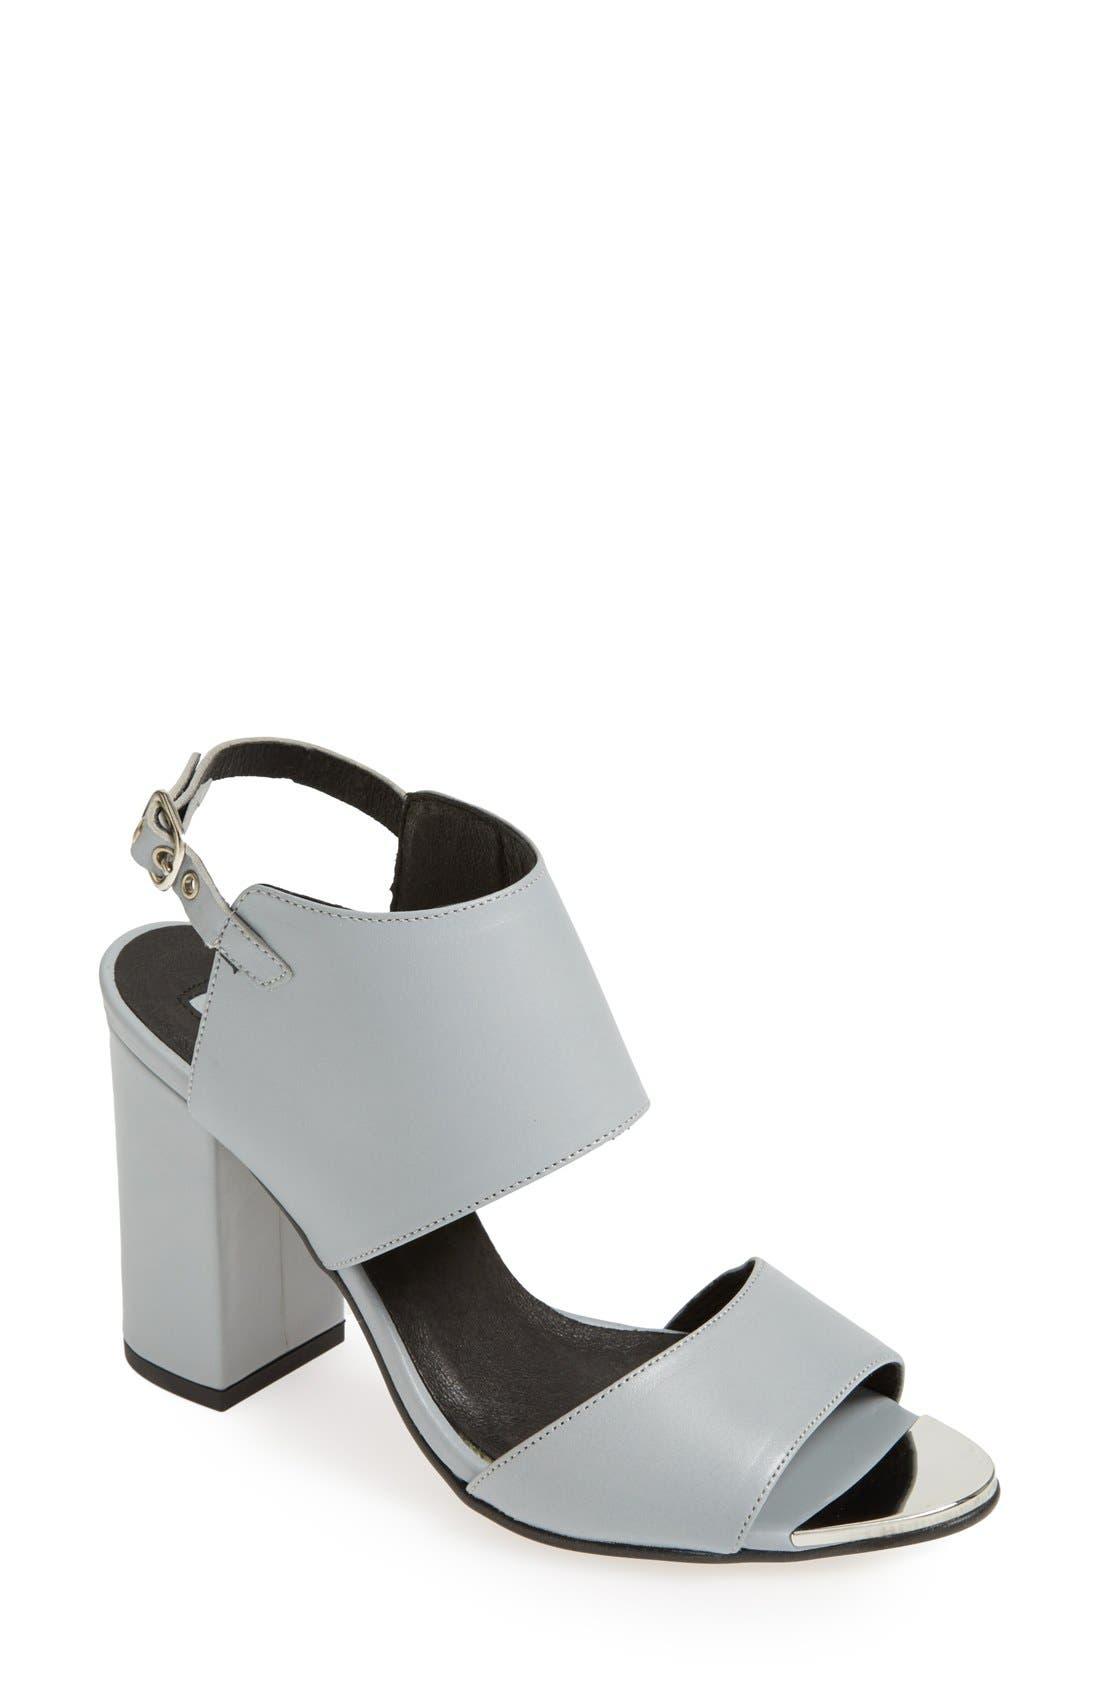 Alternate Image 1 Selected - Topshop 'Raff' Sandal (Women)